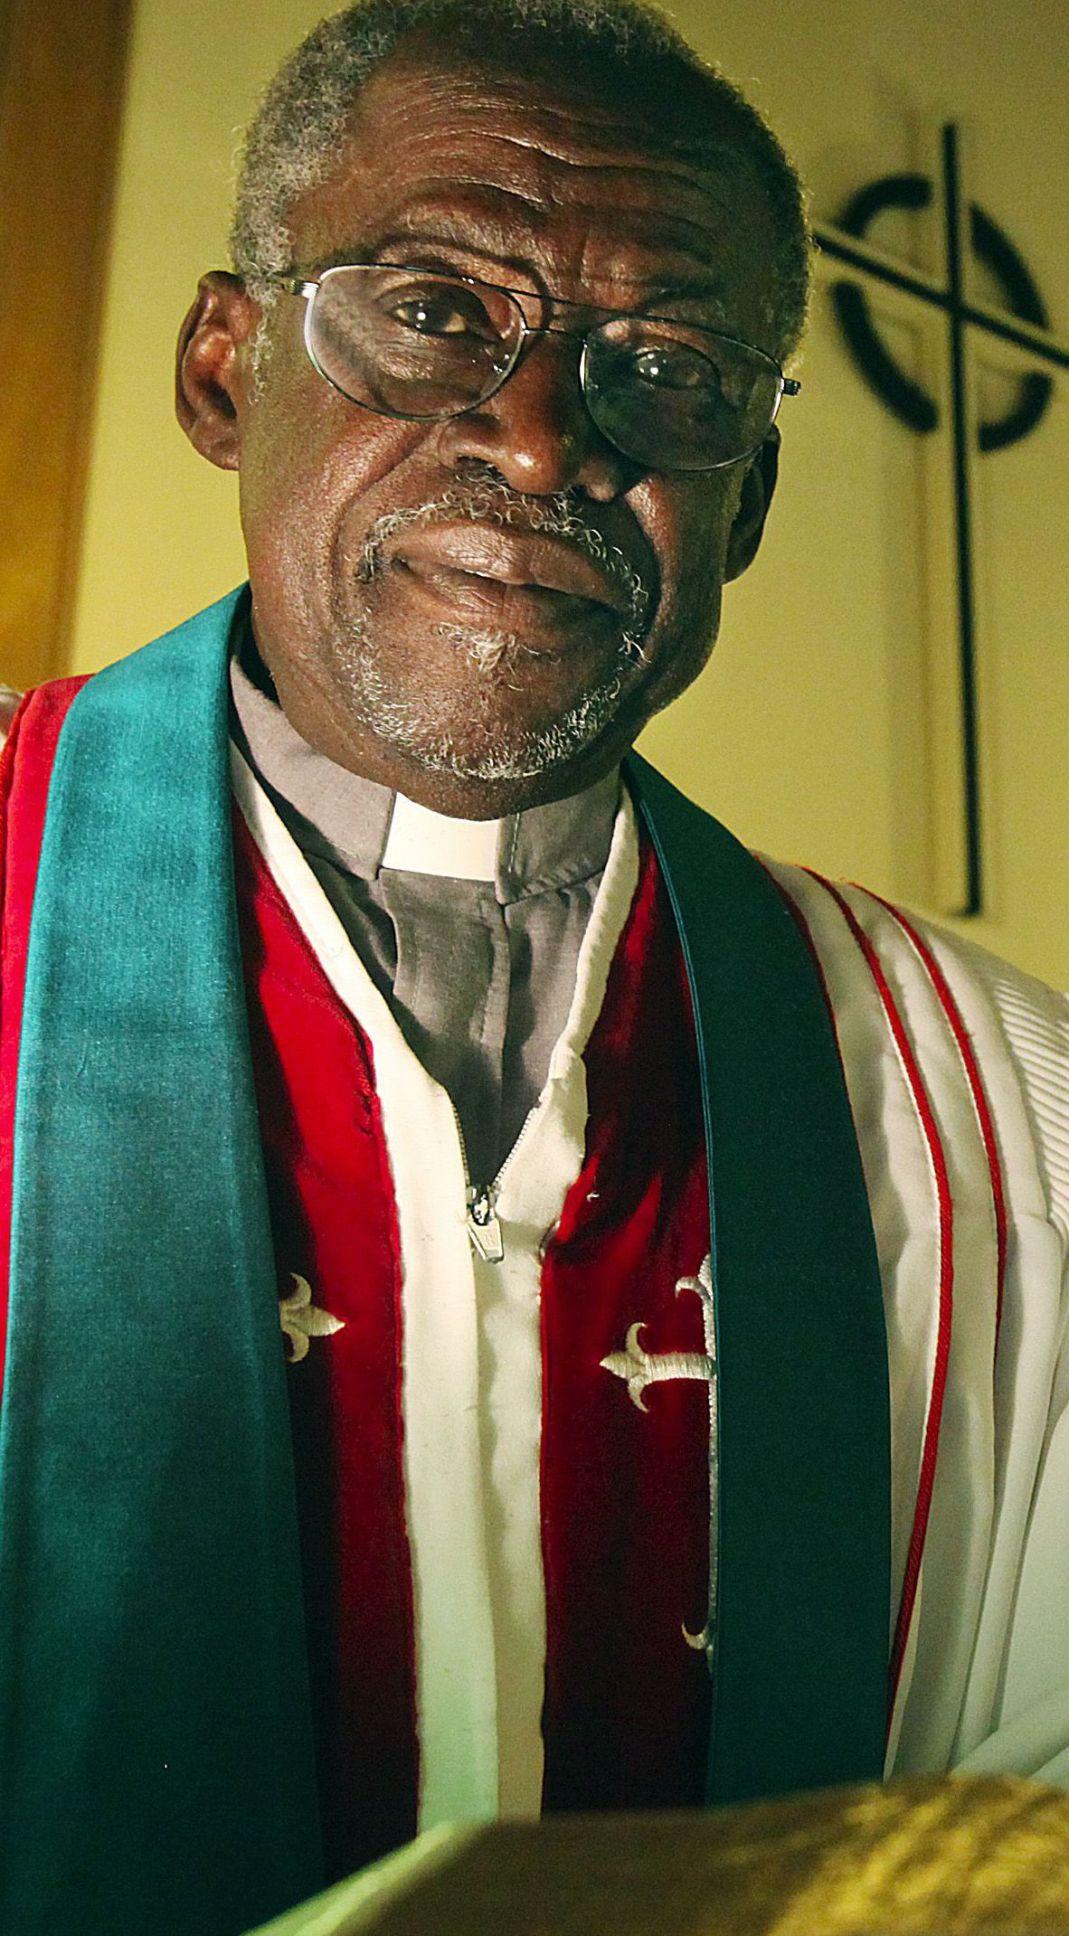 Church to honor retiring leader